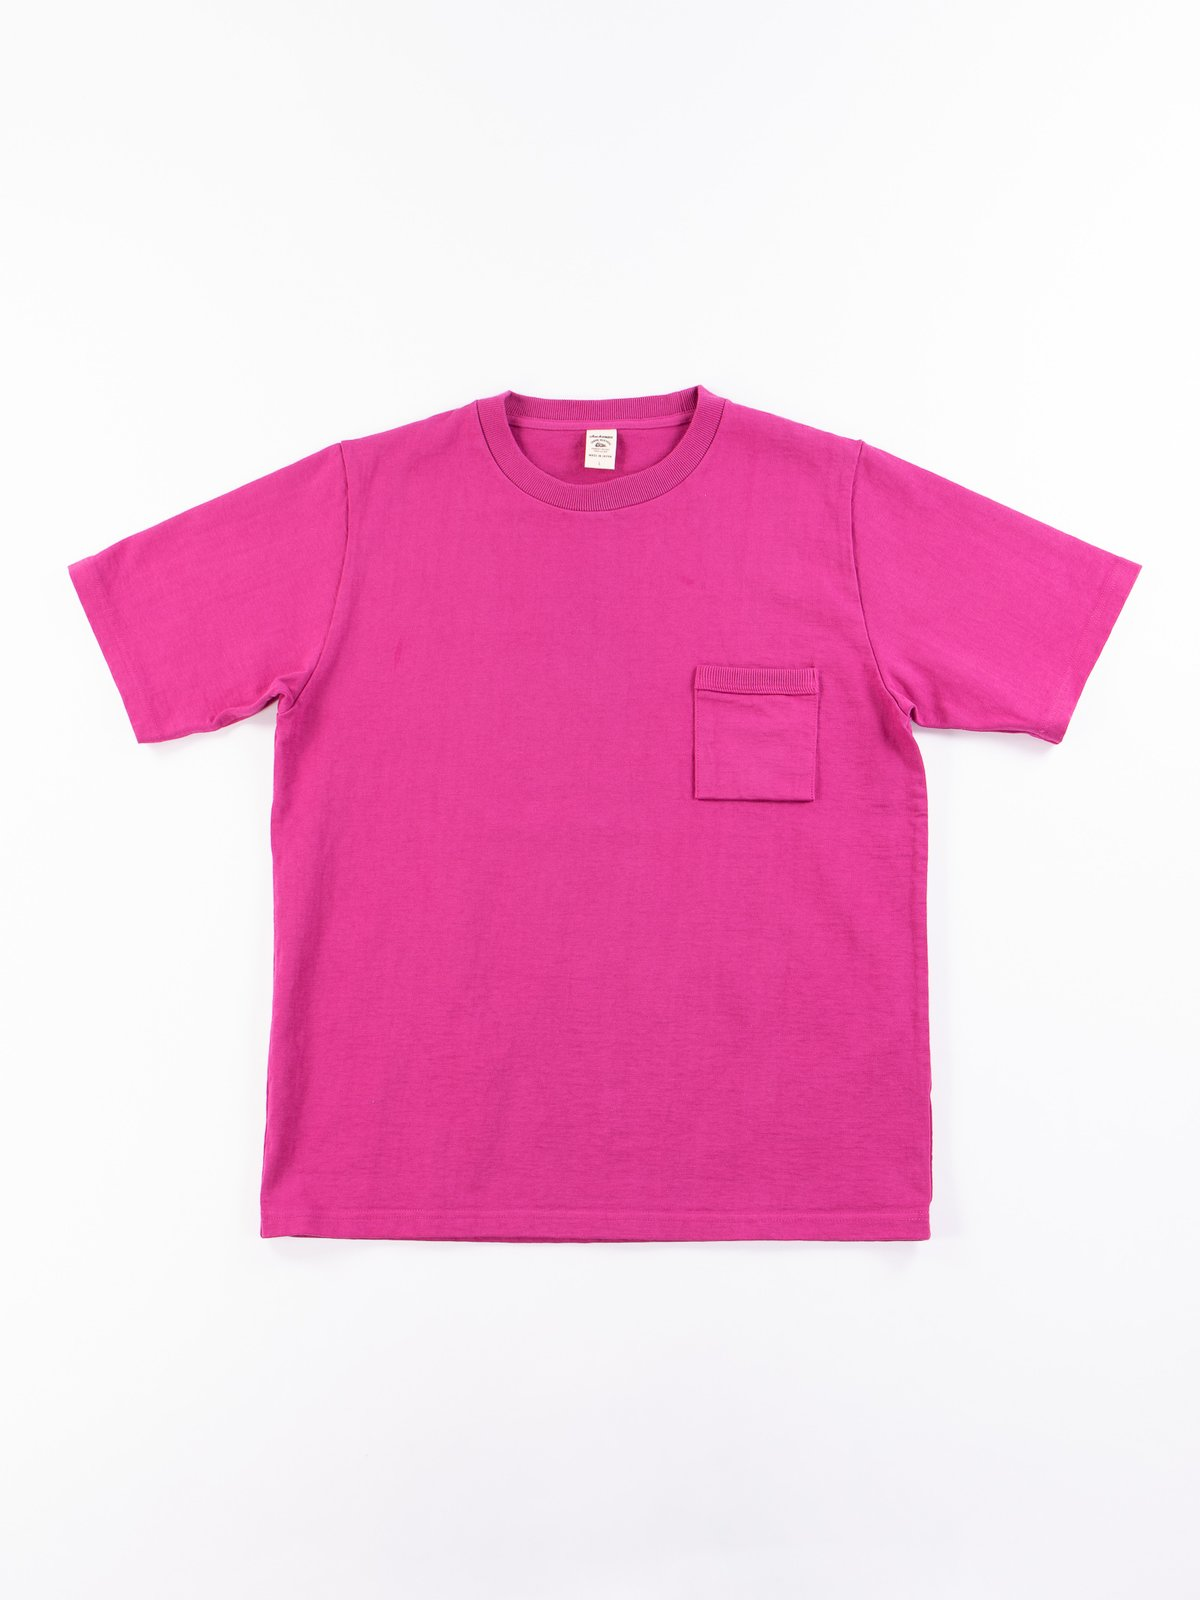 Ash Rose Dotsume Pocket T–Shirt - Image 1